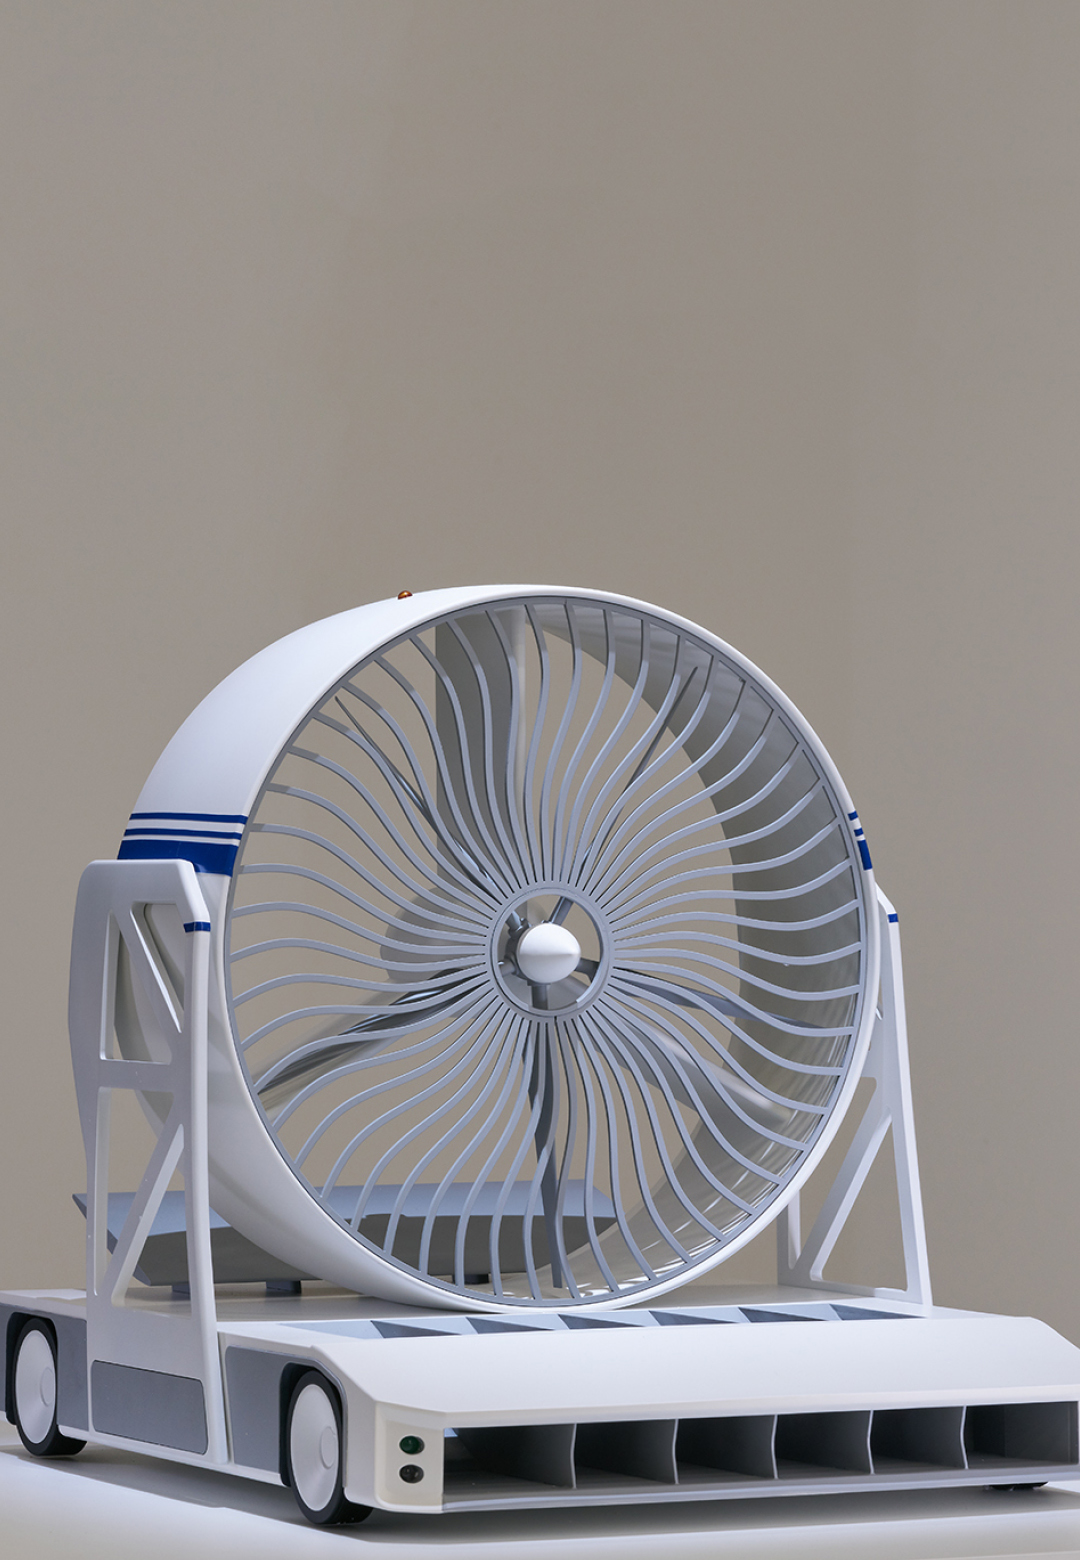 A model of the design by Dmitriy Balashov| Green Blast Jet Energy| Lexus Design Awards| STIR